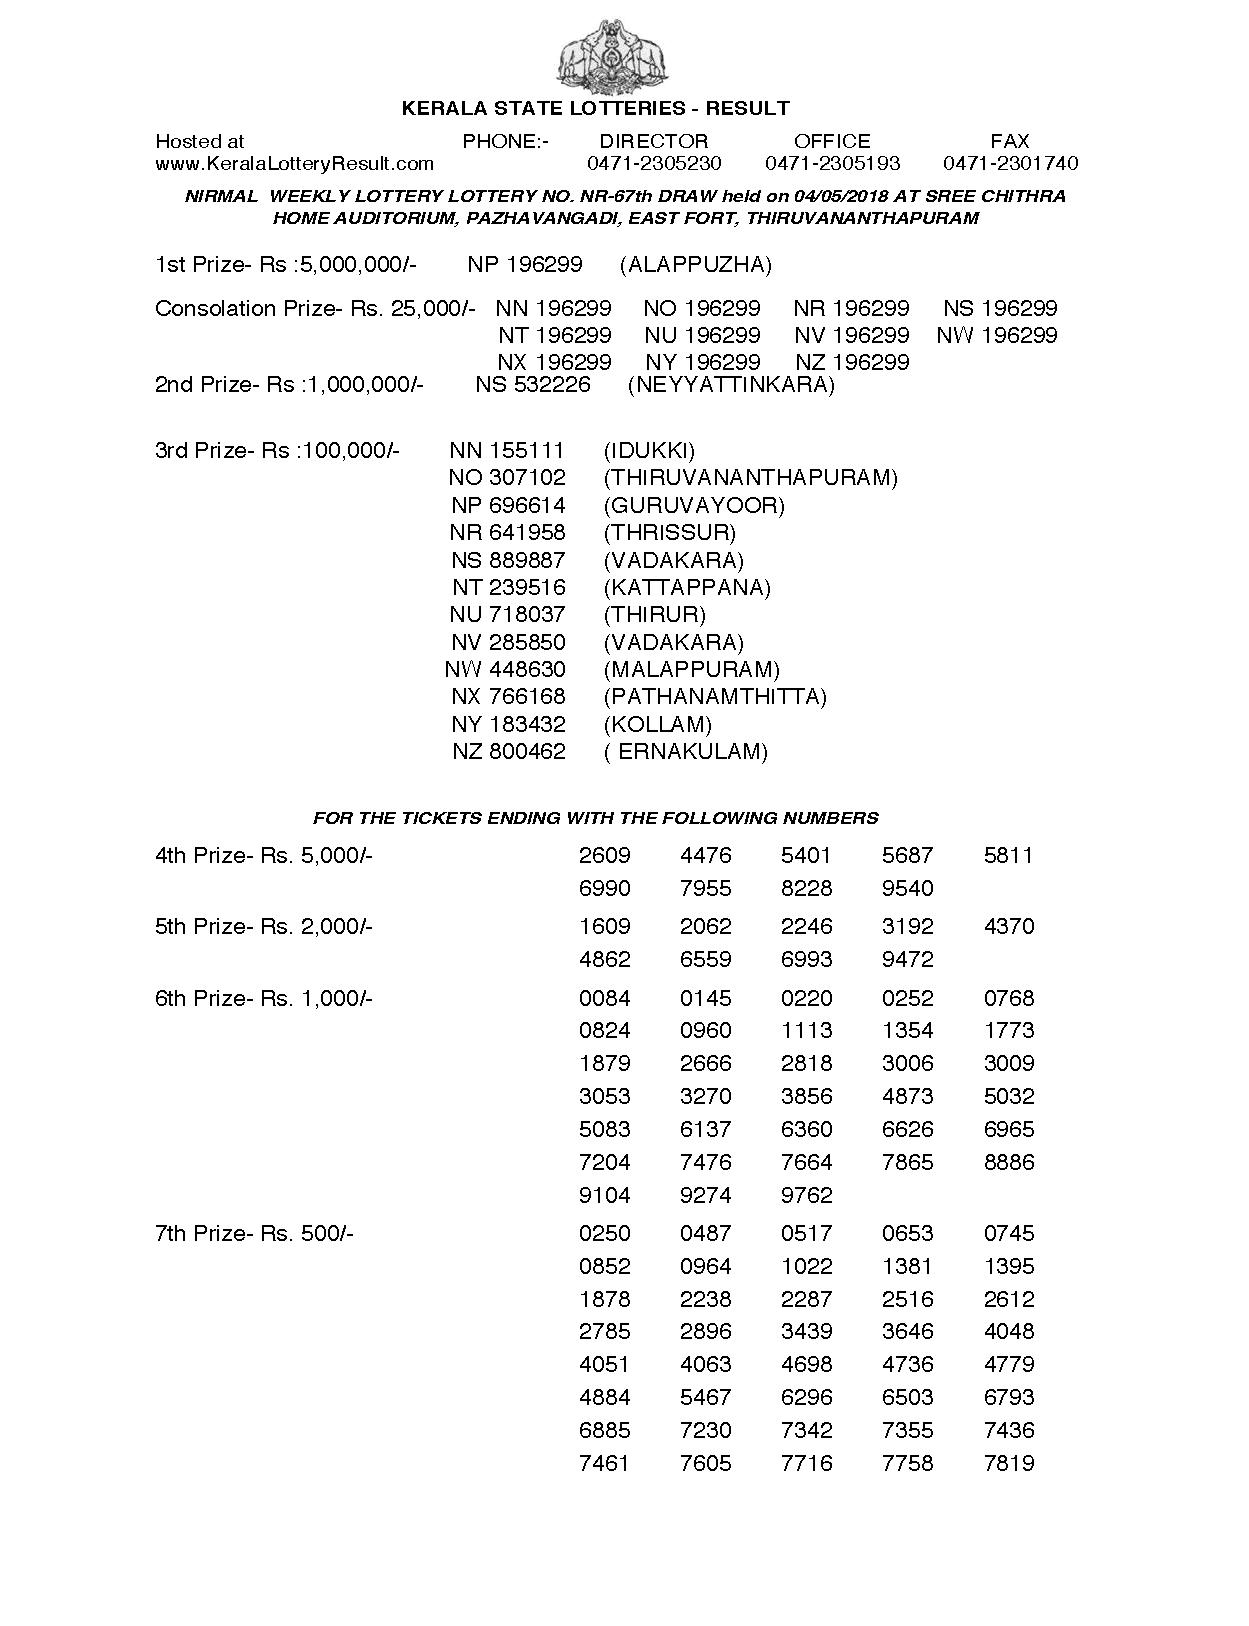 Nirmal NR67 Kerala Lottery Results Screenshot: Page 1